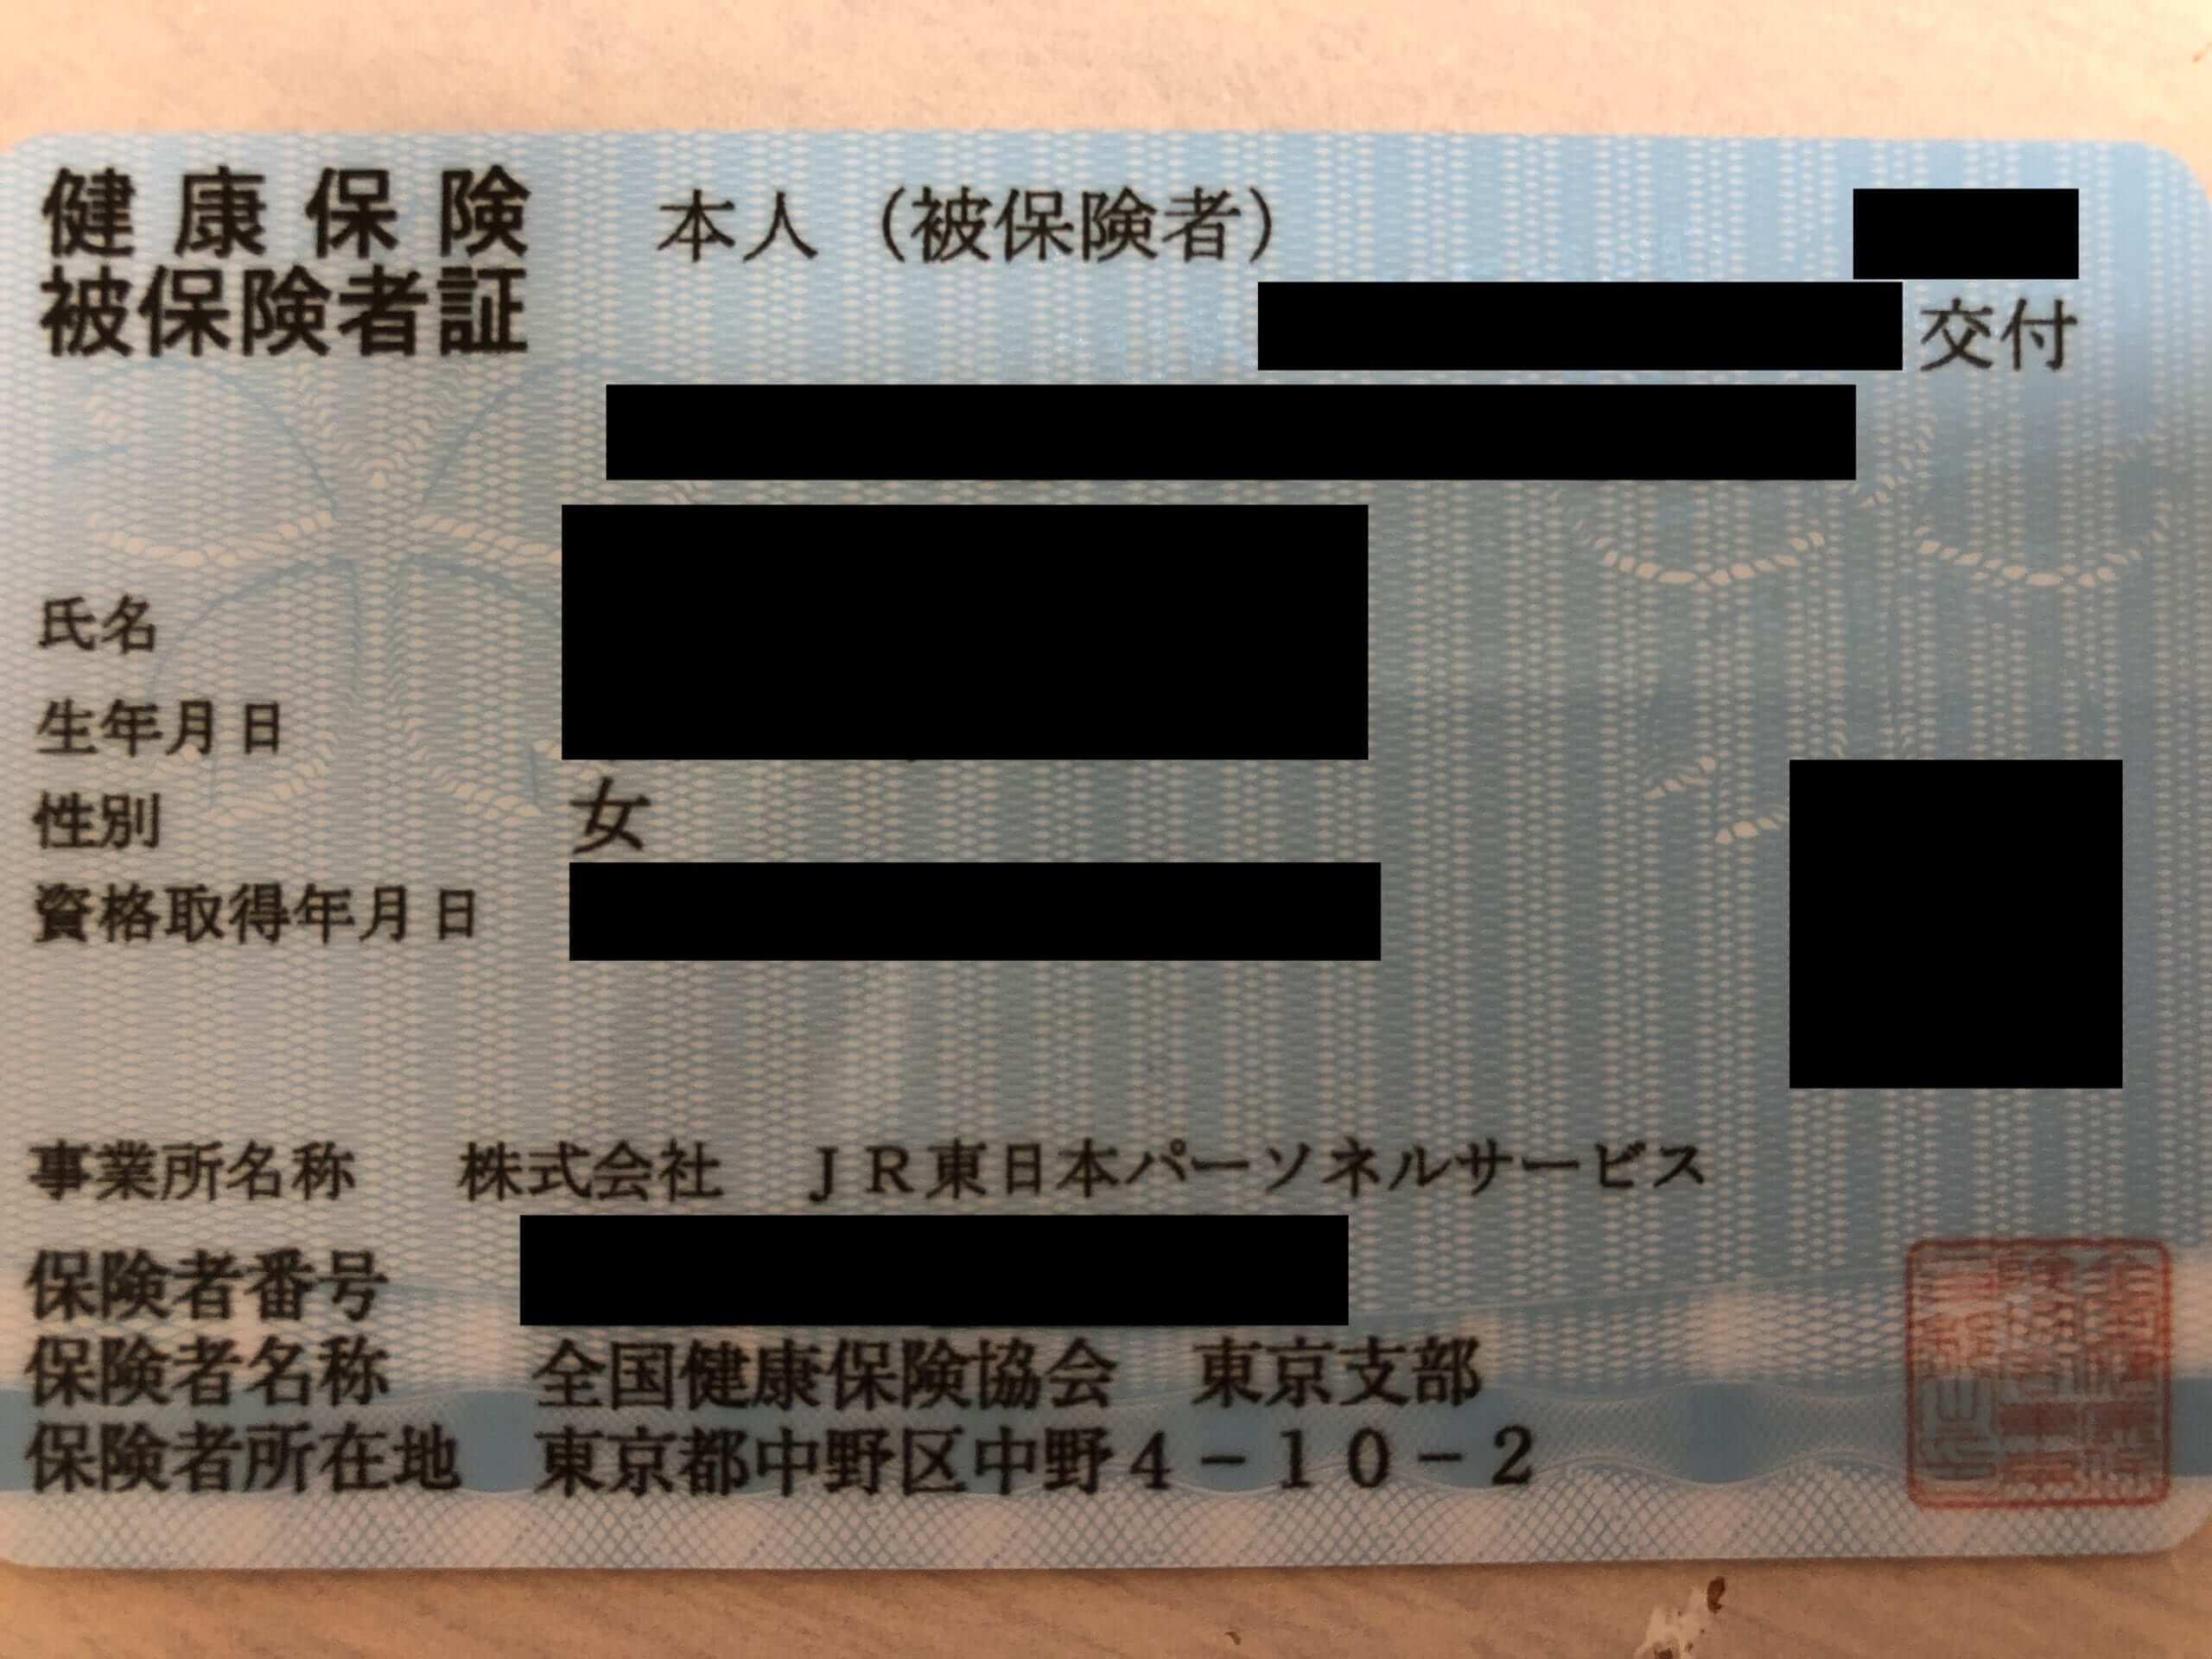 JR東日本パーソナルサービス